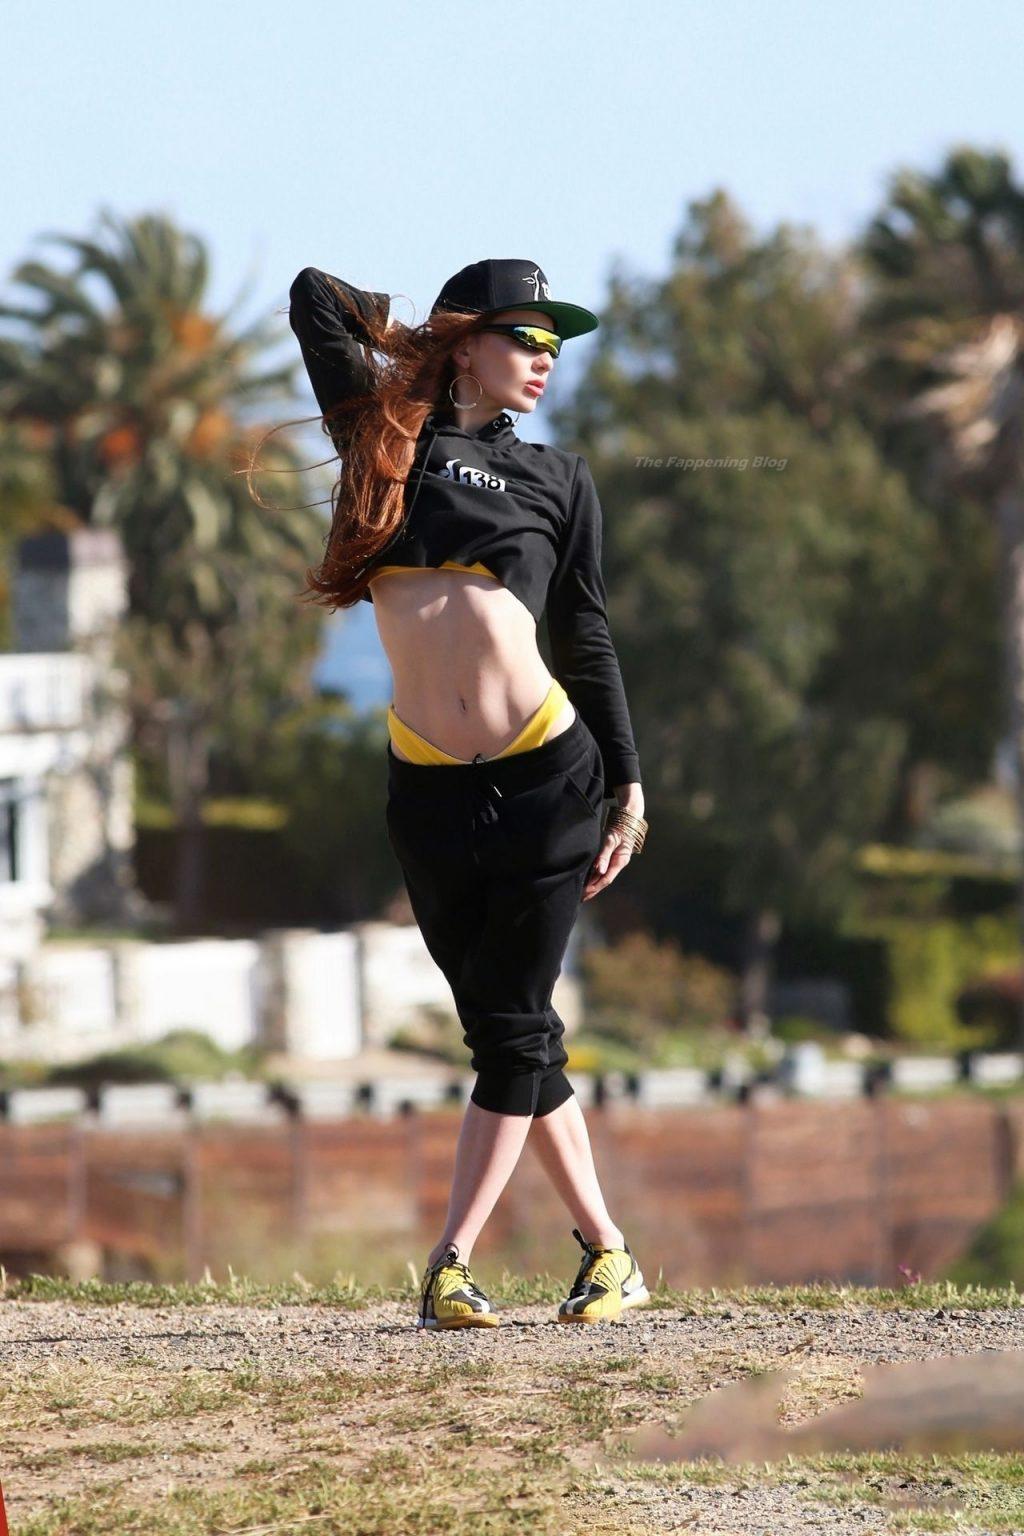 Silence Nicole is Seen Shooting for 138 Streetwear Brand (32 Photos)